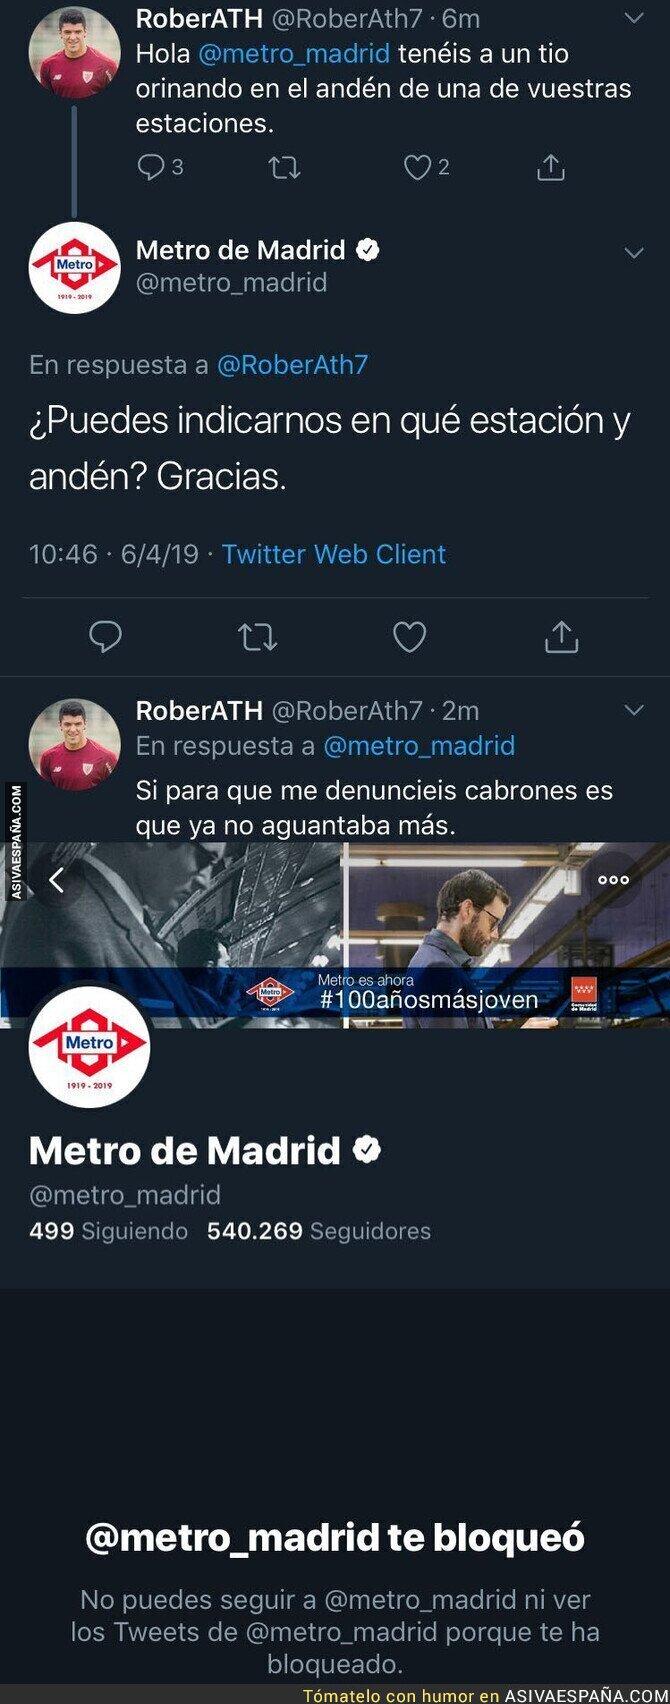 108360 - La historia del metro de Madrid que emocionó a Steven Spielberg